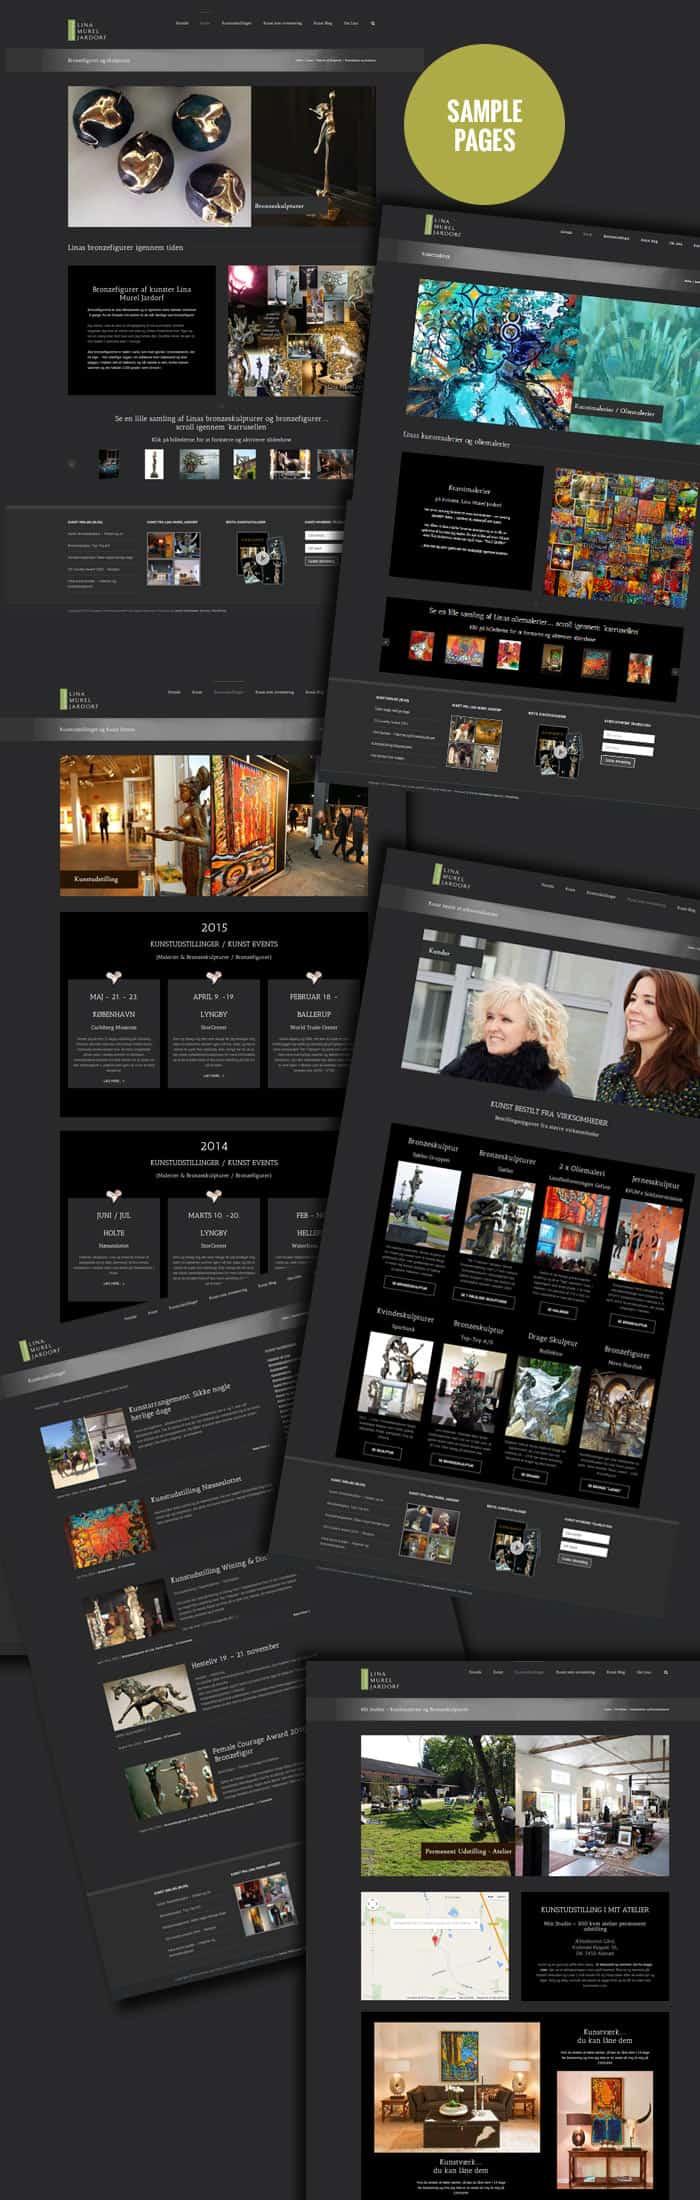 Ny hjemmeside sider screenshots